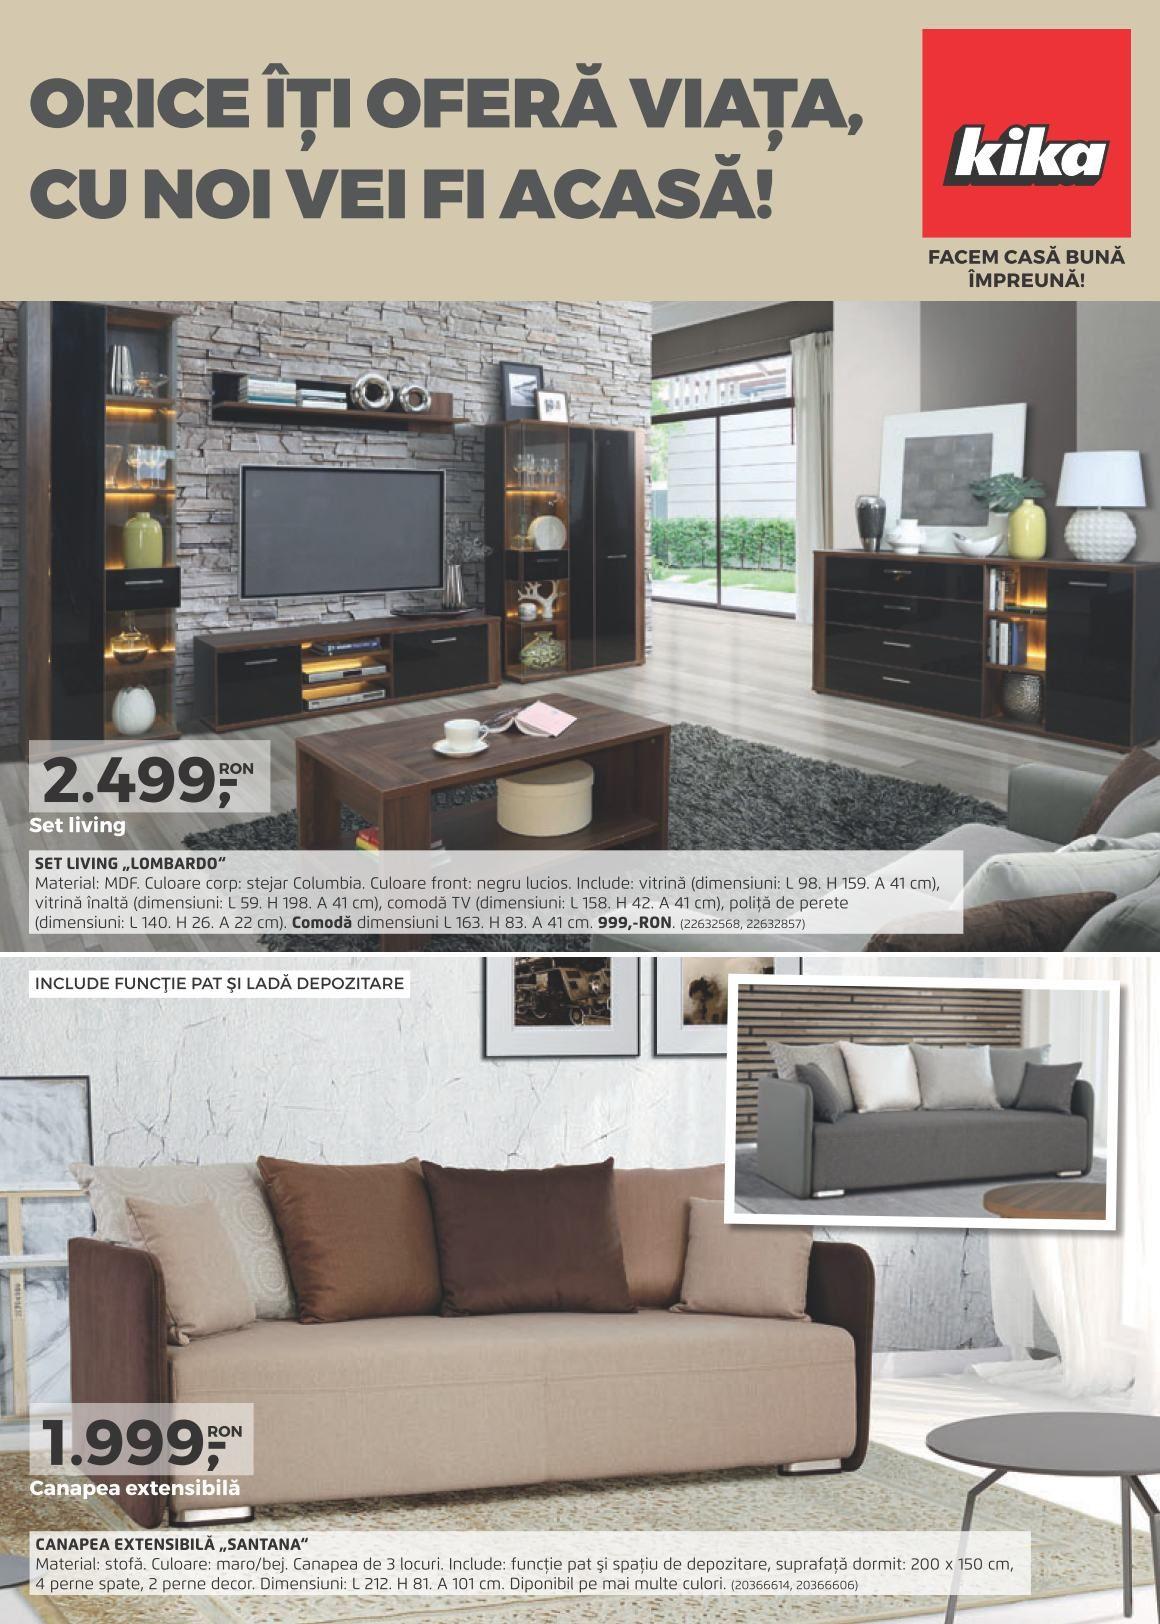 Catalog kika oferte mobilier romania august 2017 design si mobila pinterest romania for Catalogue mobilier design